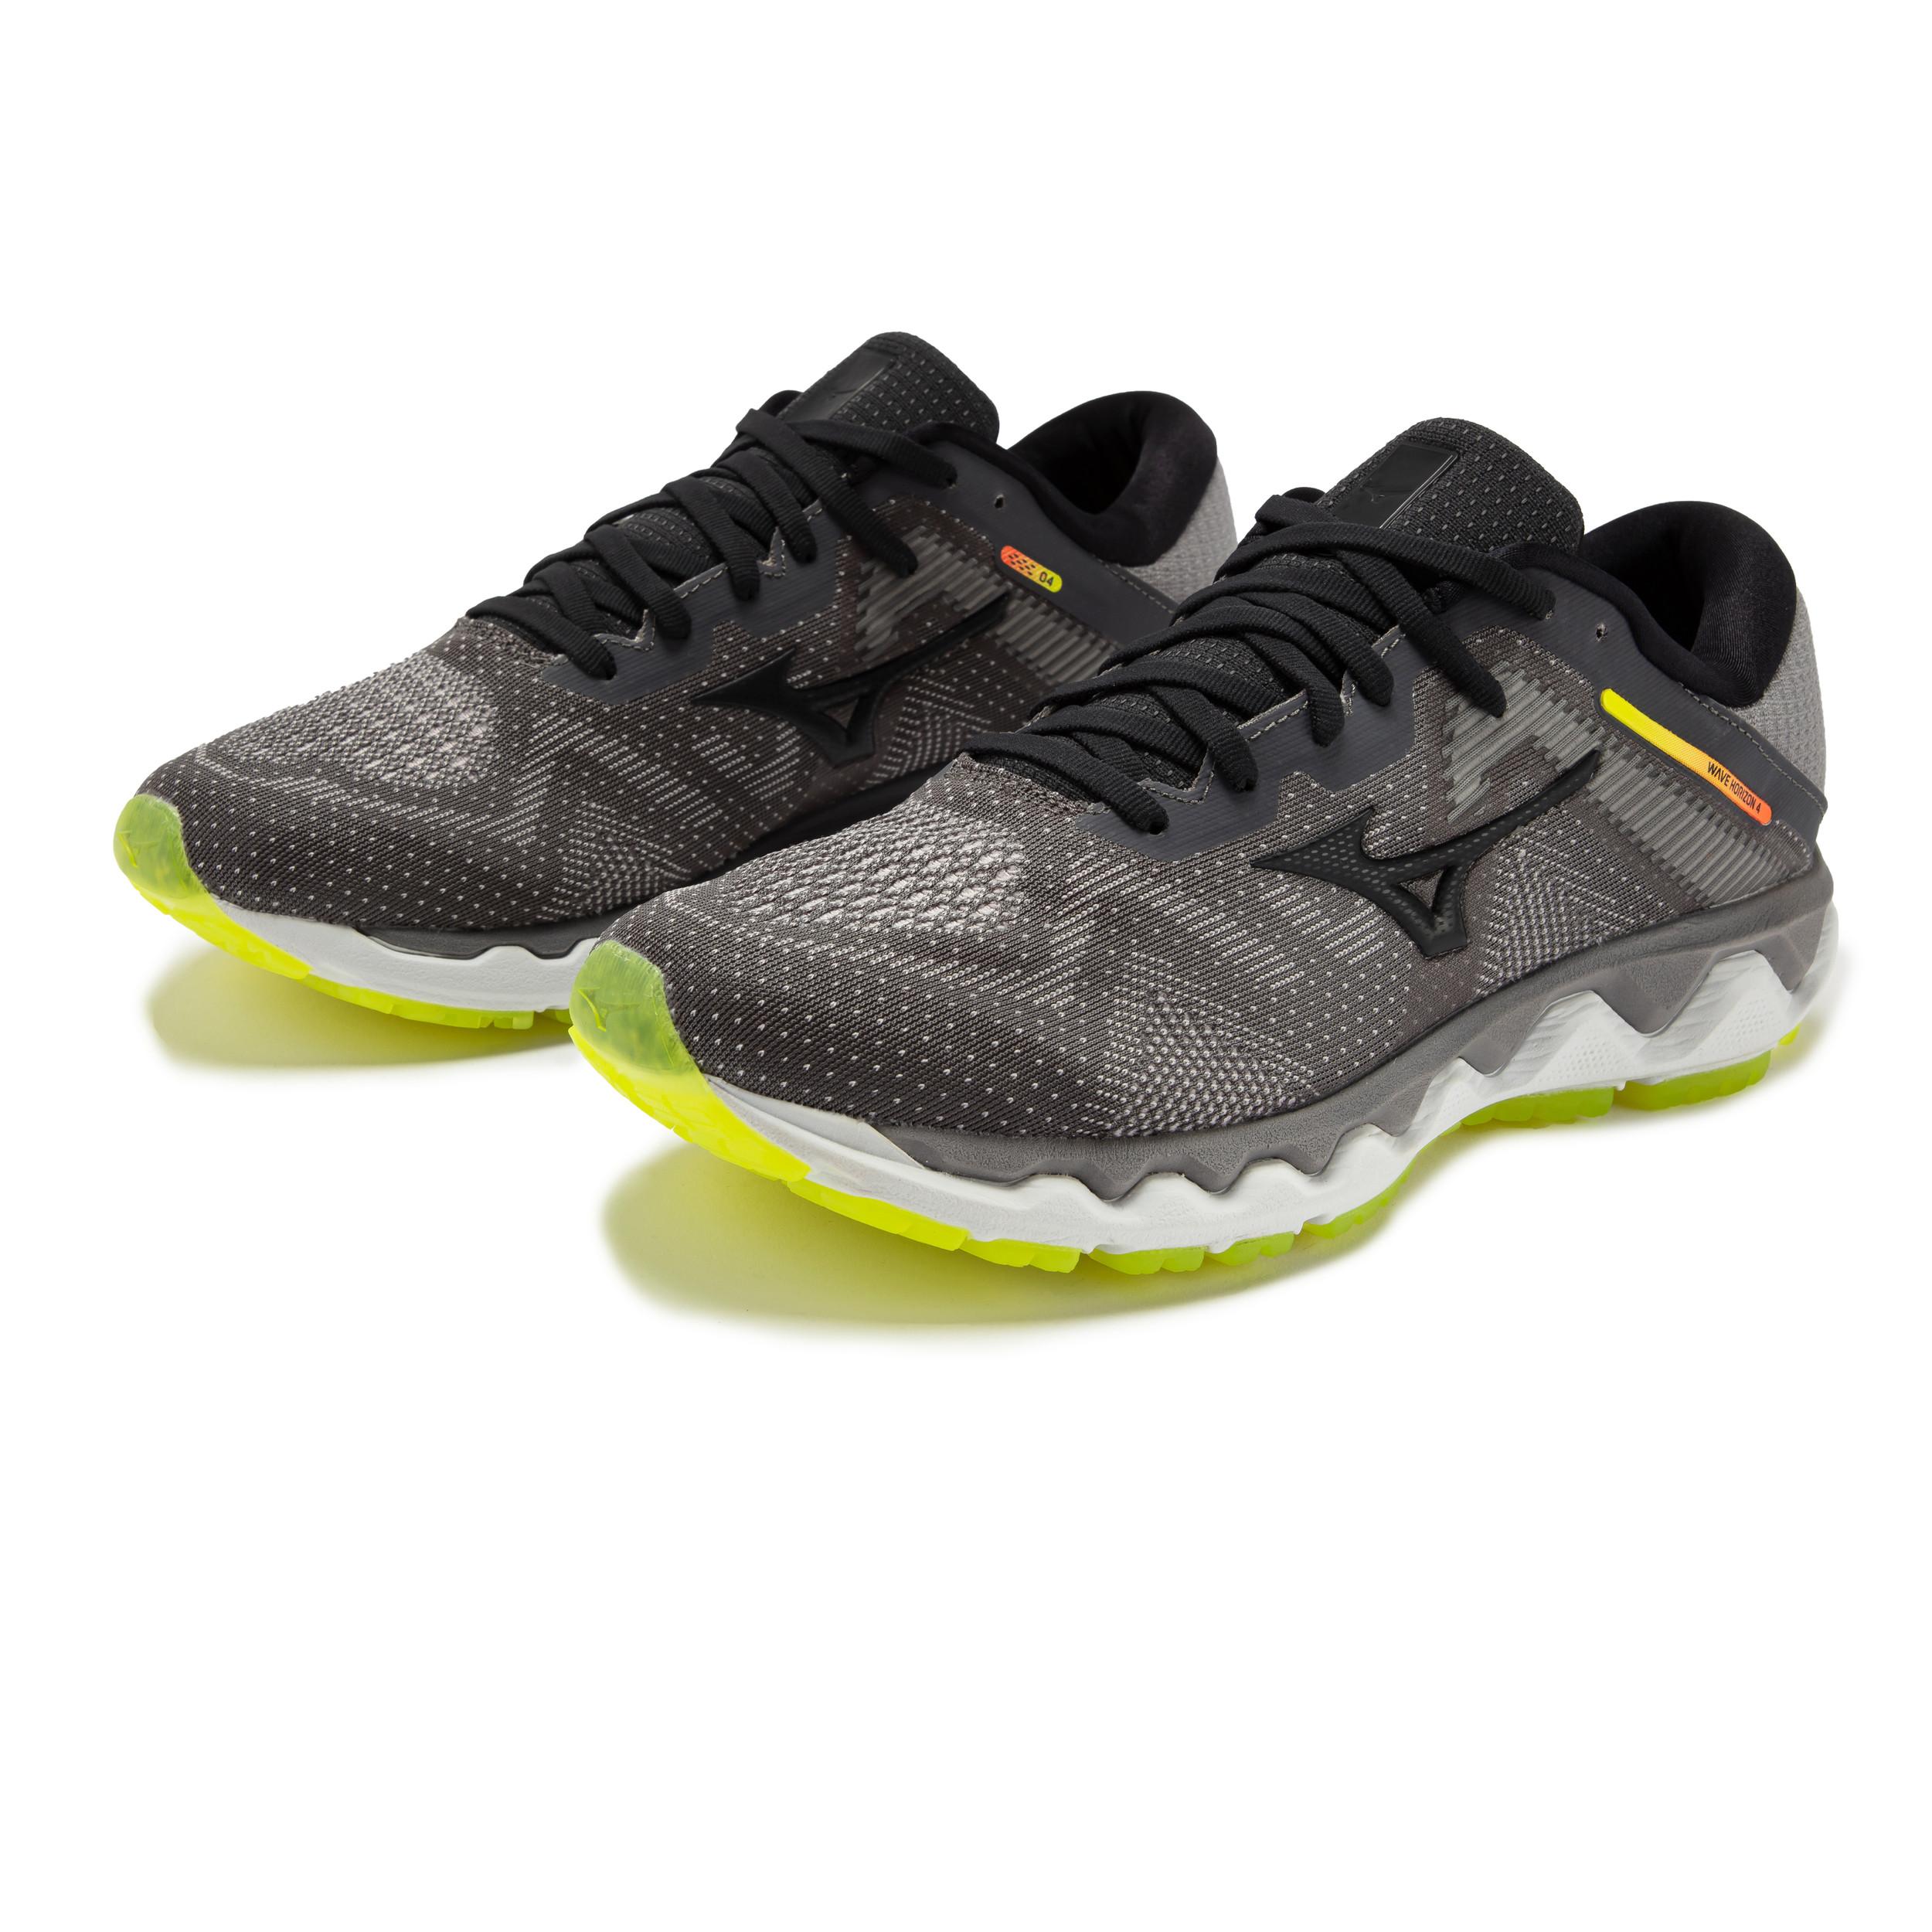 Mizuno Wave Horizon 4 Running Shoes - AW20